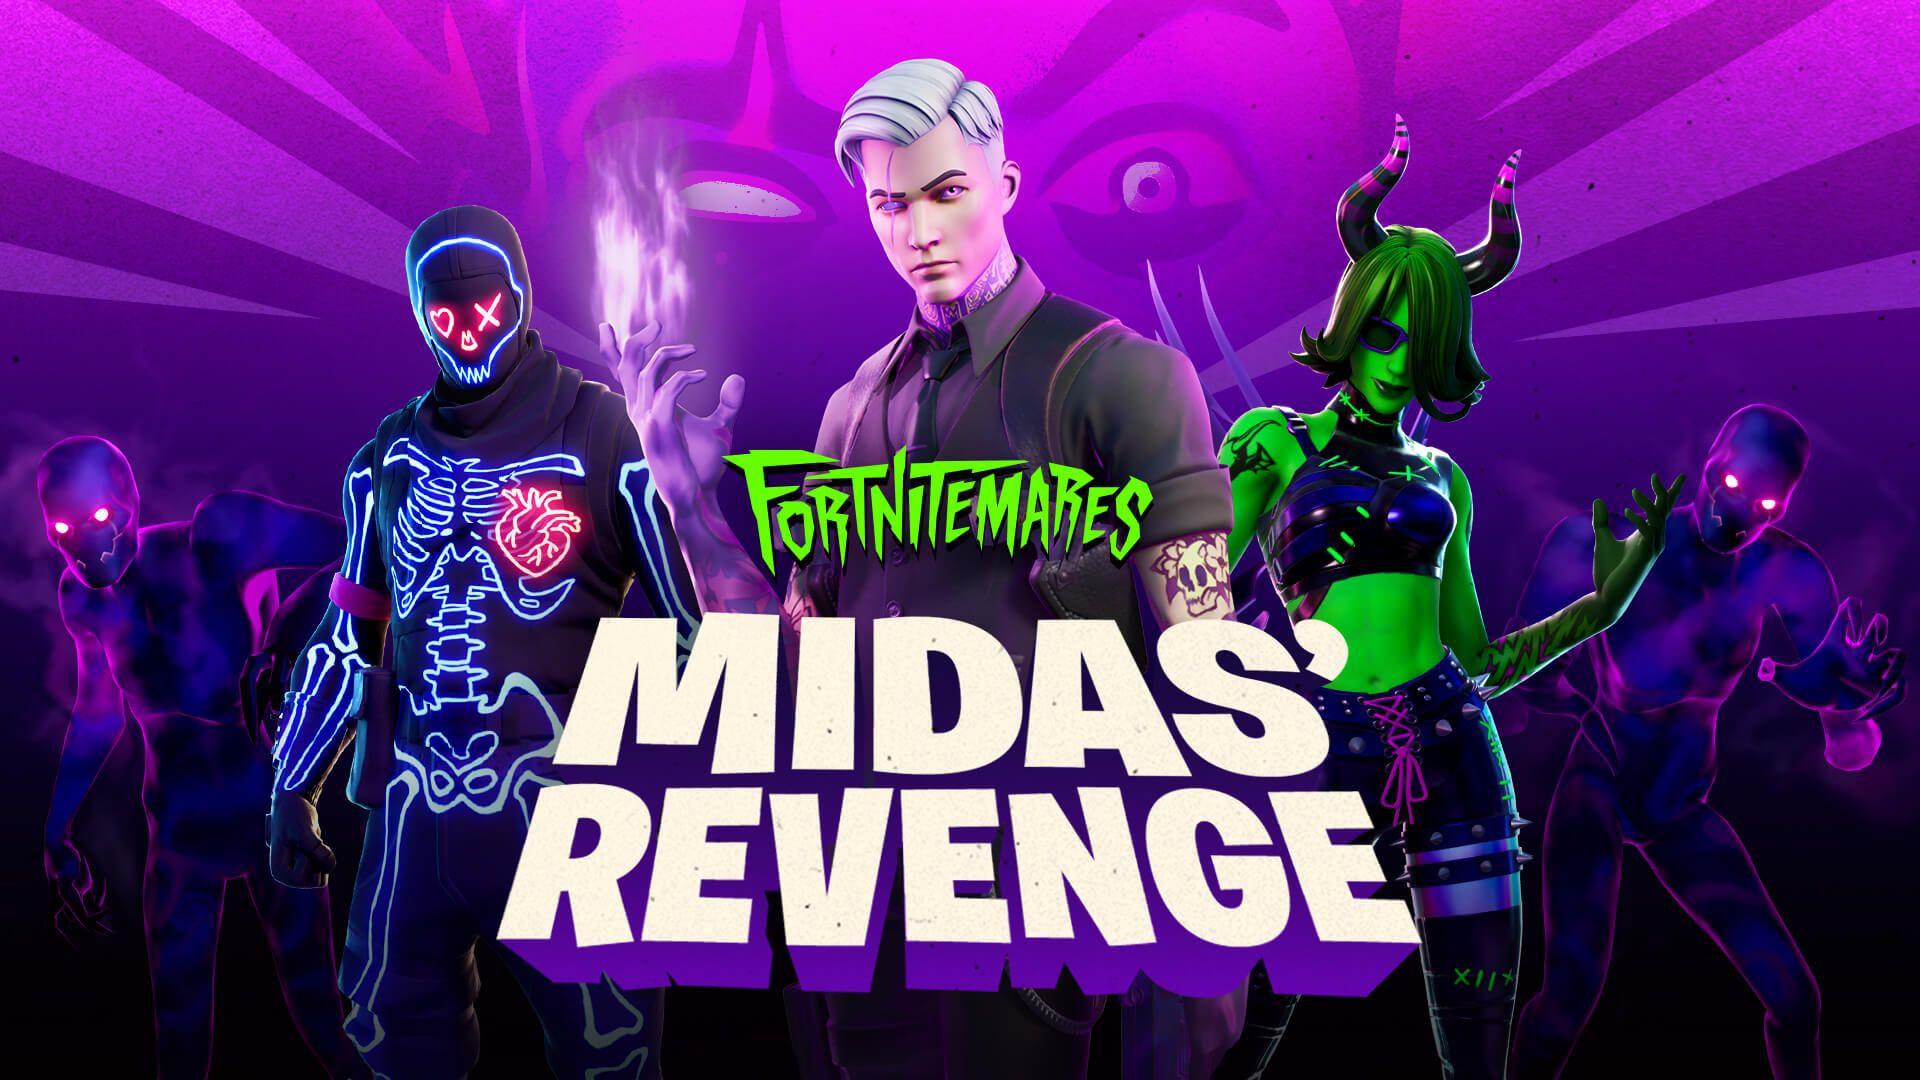 Midas Revenge Wallpapers 1920x1080